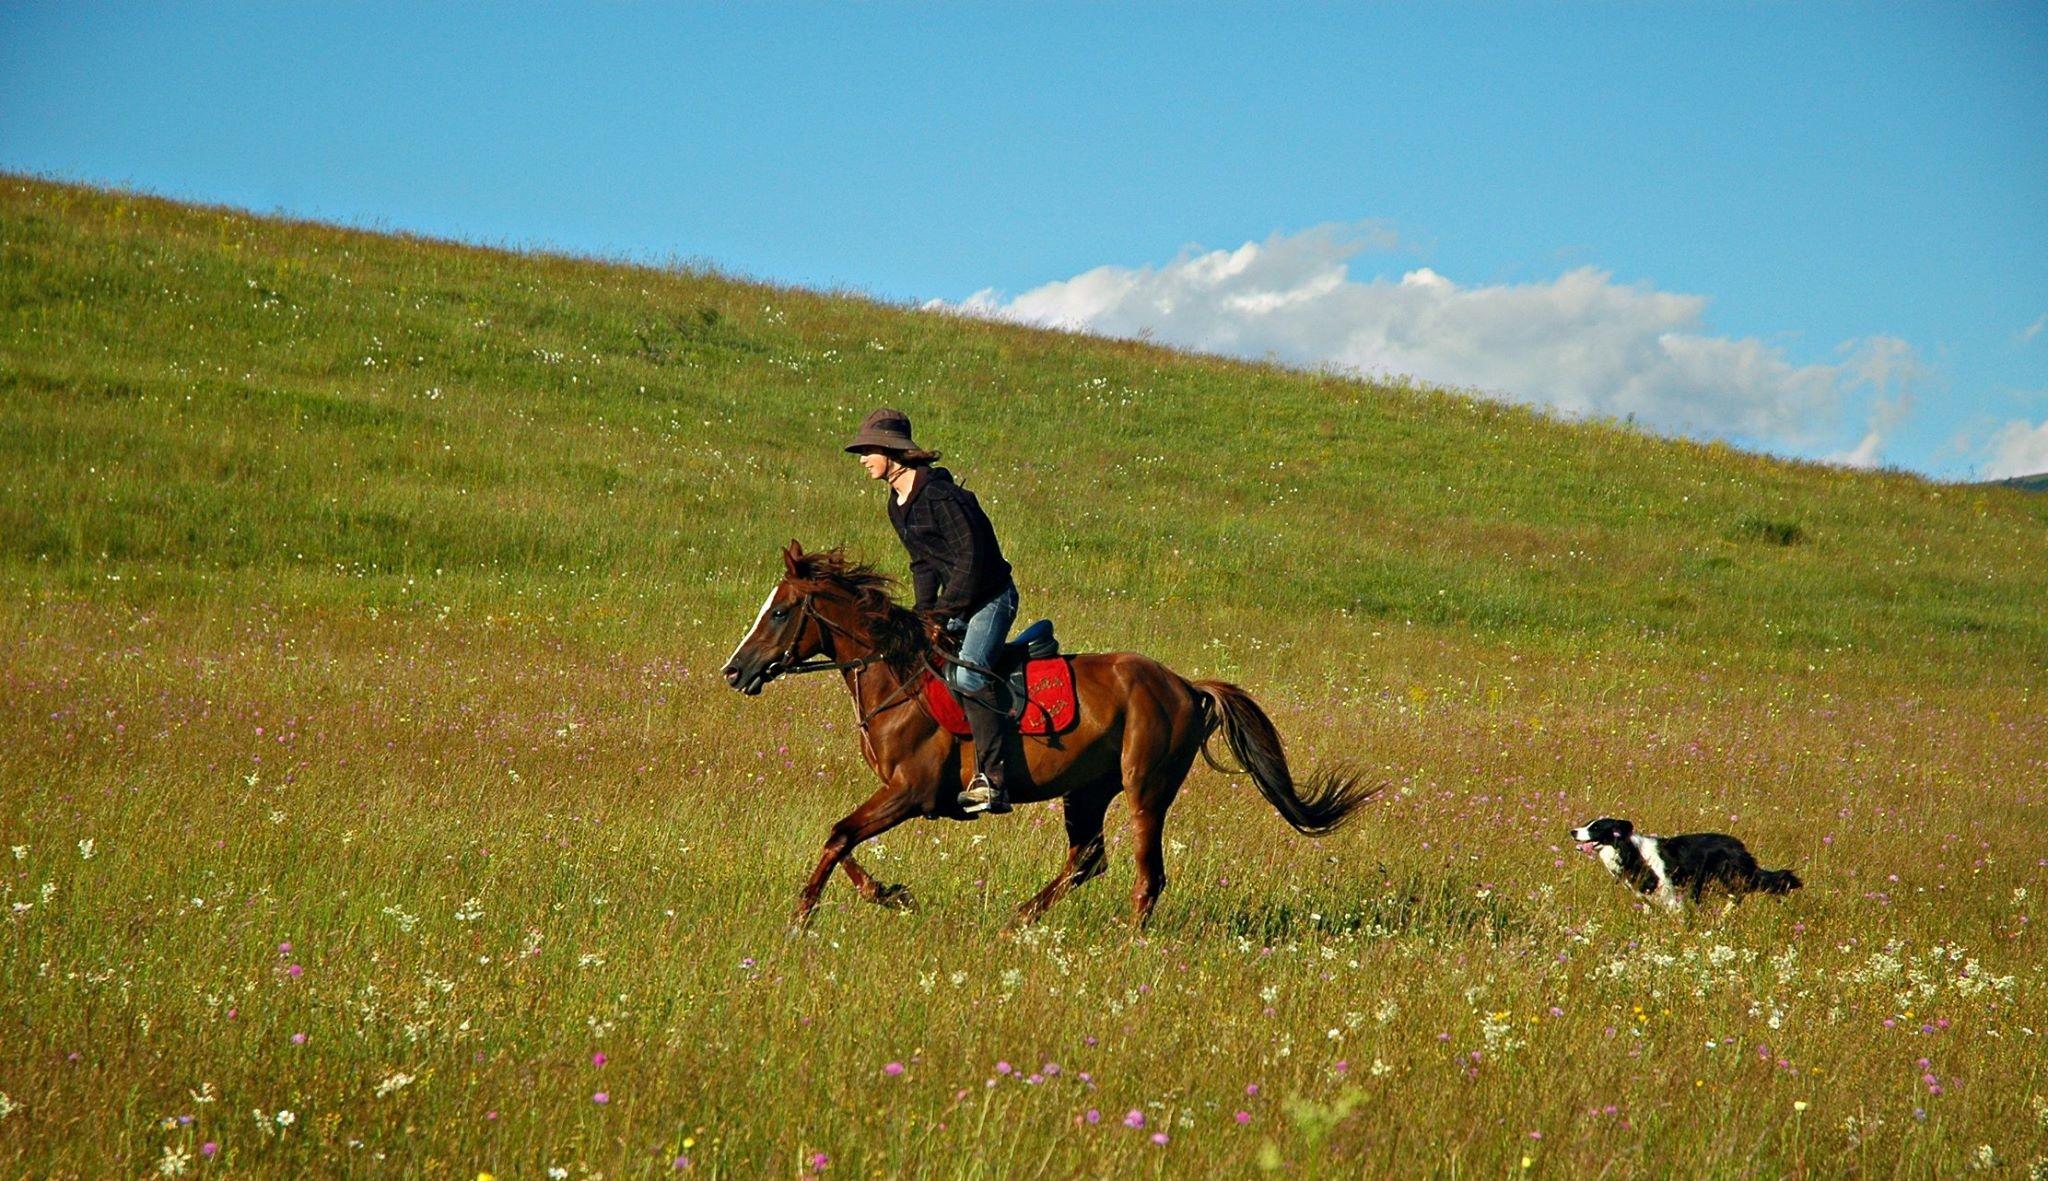 Horse Riding Wallpaper Hd Kupres Farm Riding Holiday In Bosnia And Herzegovina Far